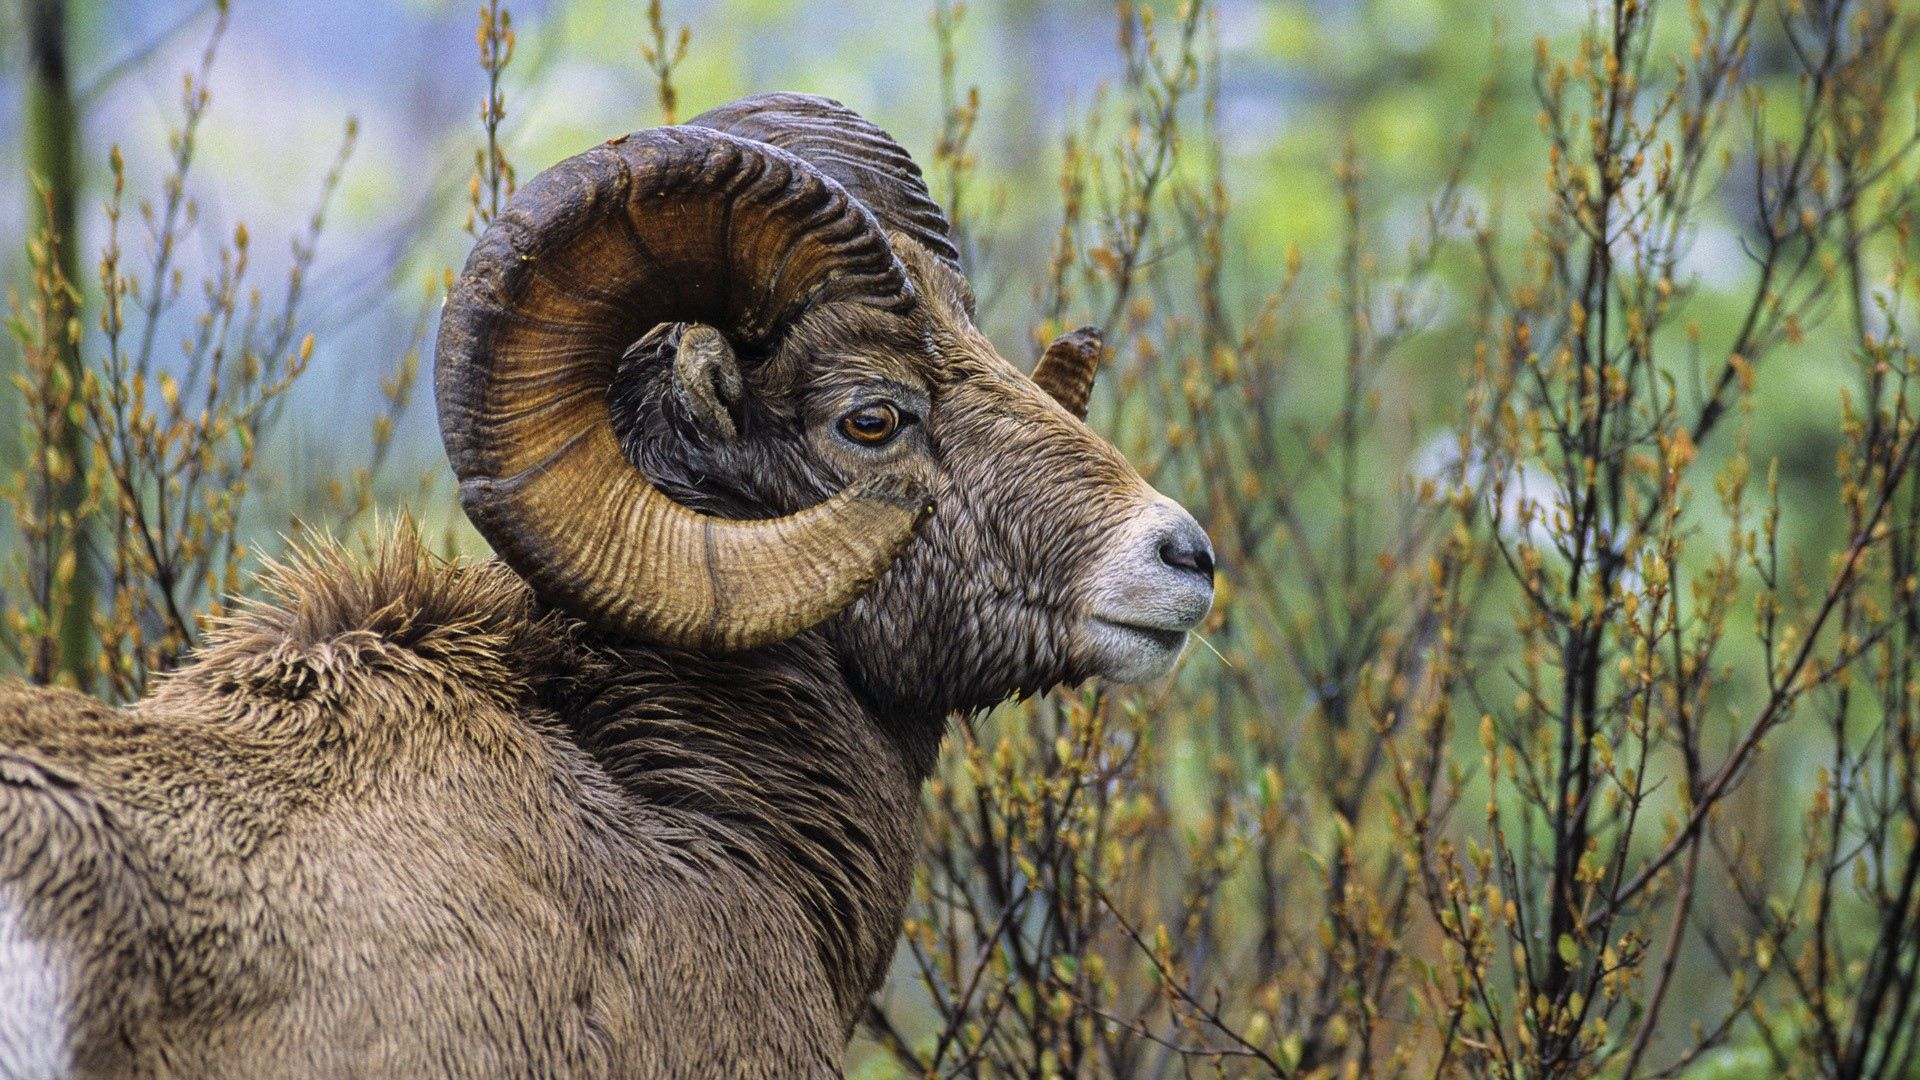 95774 download wallpaper Animals, Big Horned Ram, Bolshevik Sheep, Ram, Grass, Horns, Head screensavers and pictures for free